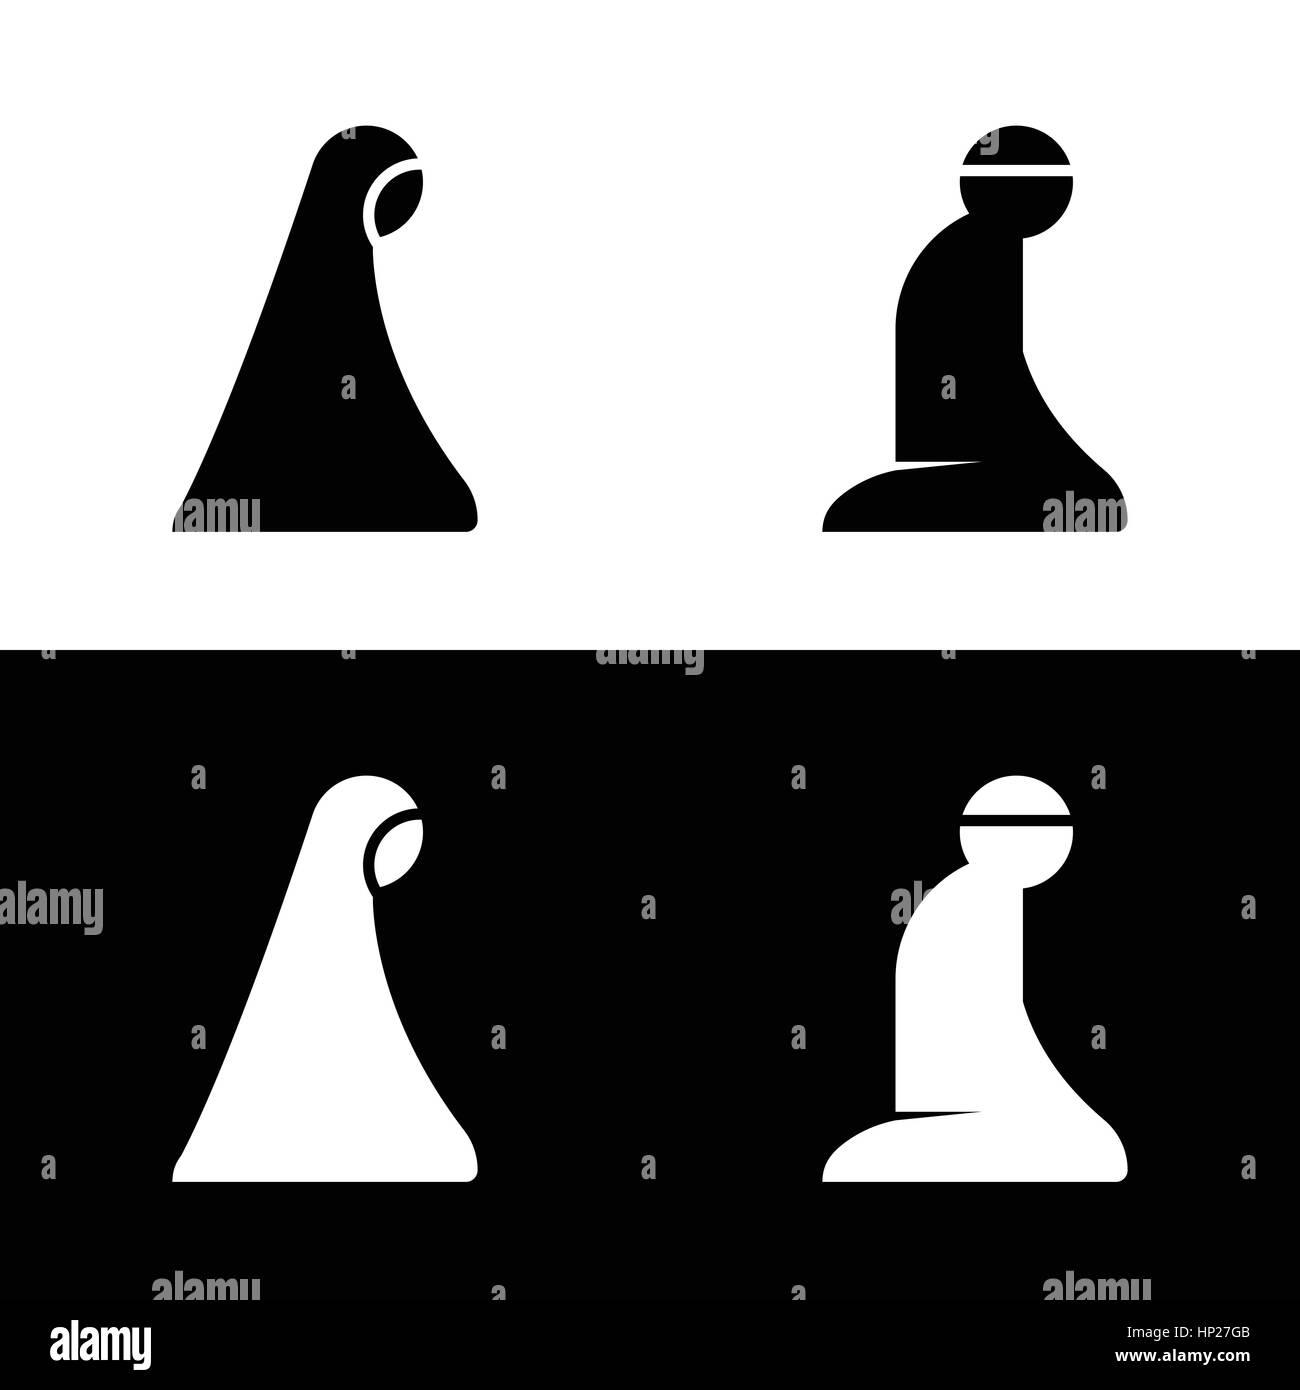 Islamic Prayer Room Area Sign Symbol Logo Icon Vector Illustration - Stock Image